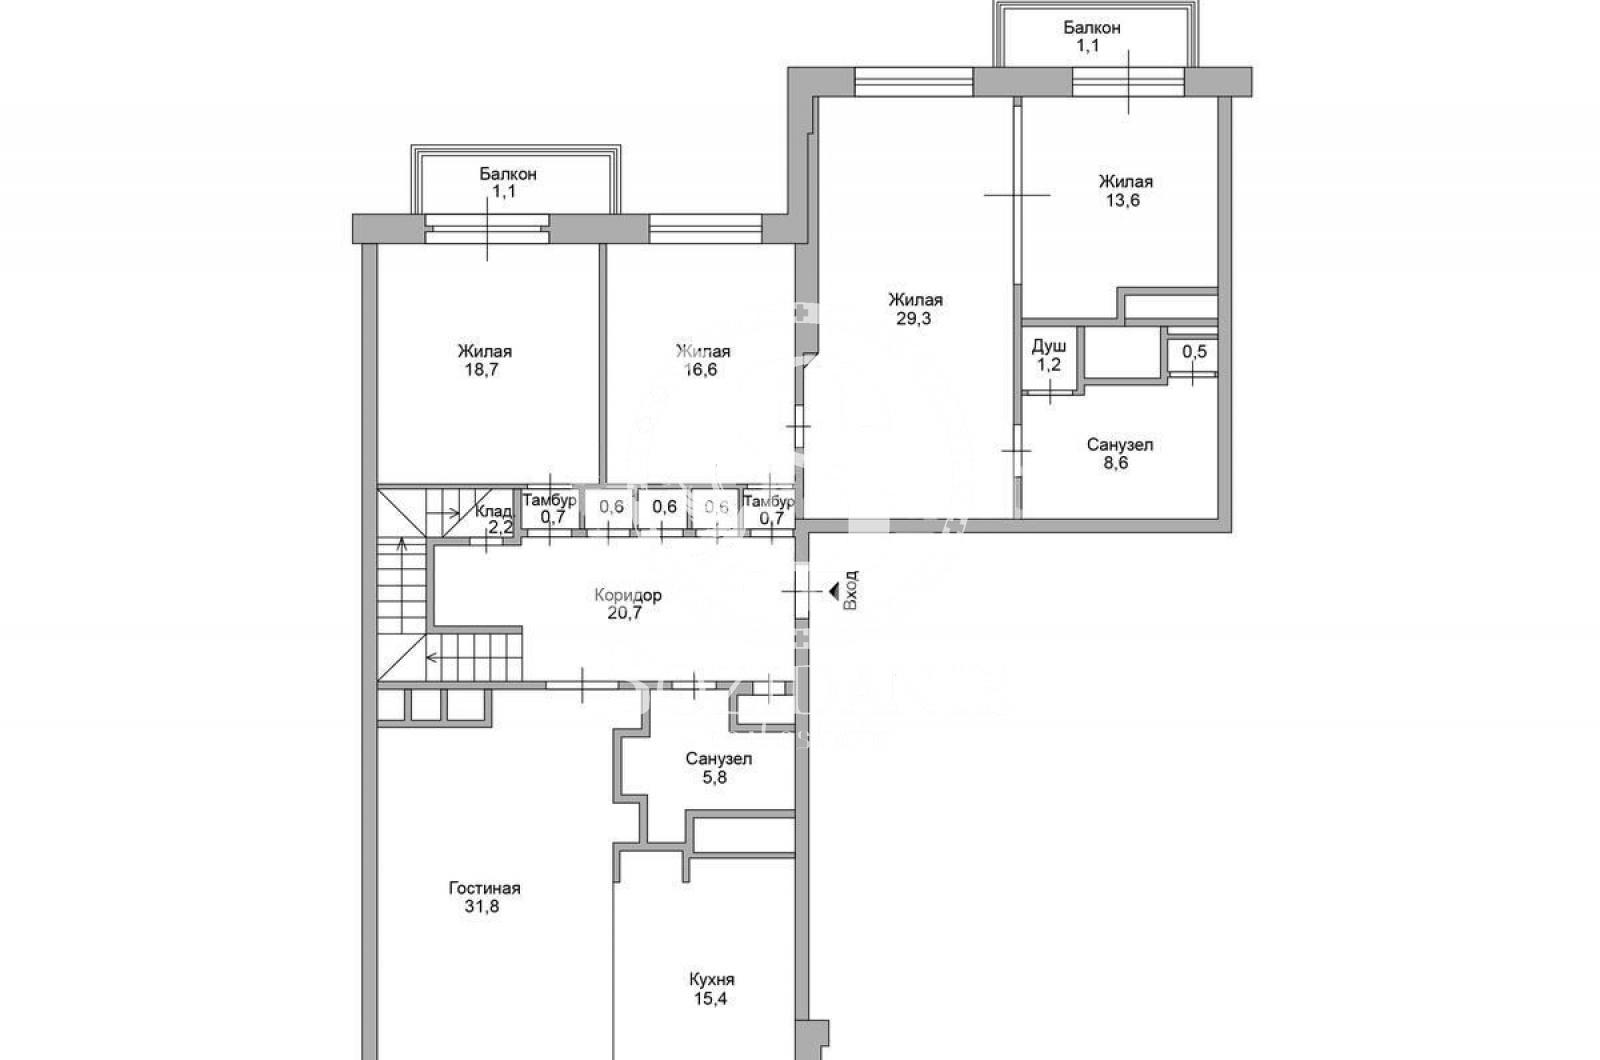 6 Комнаты, Городская, Продажа, Улица Пырьева, Listing ID 3440, Москва, Россия,